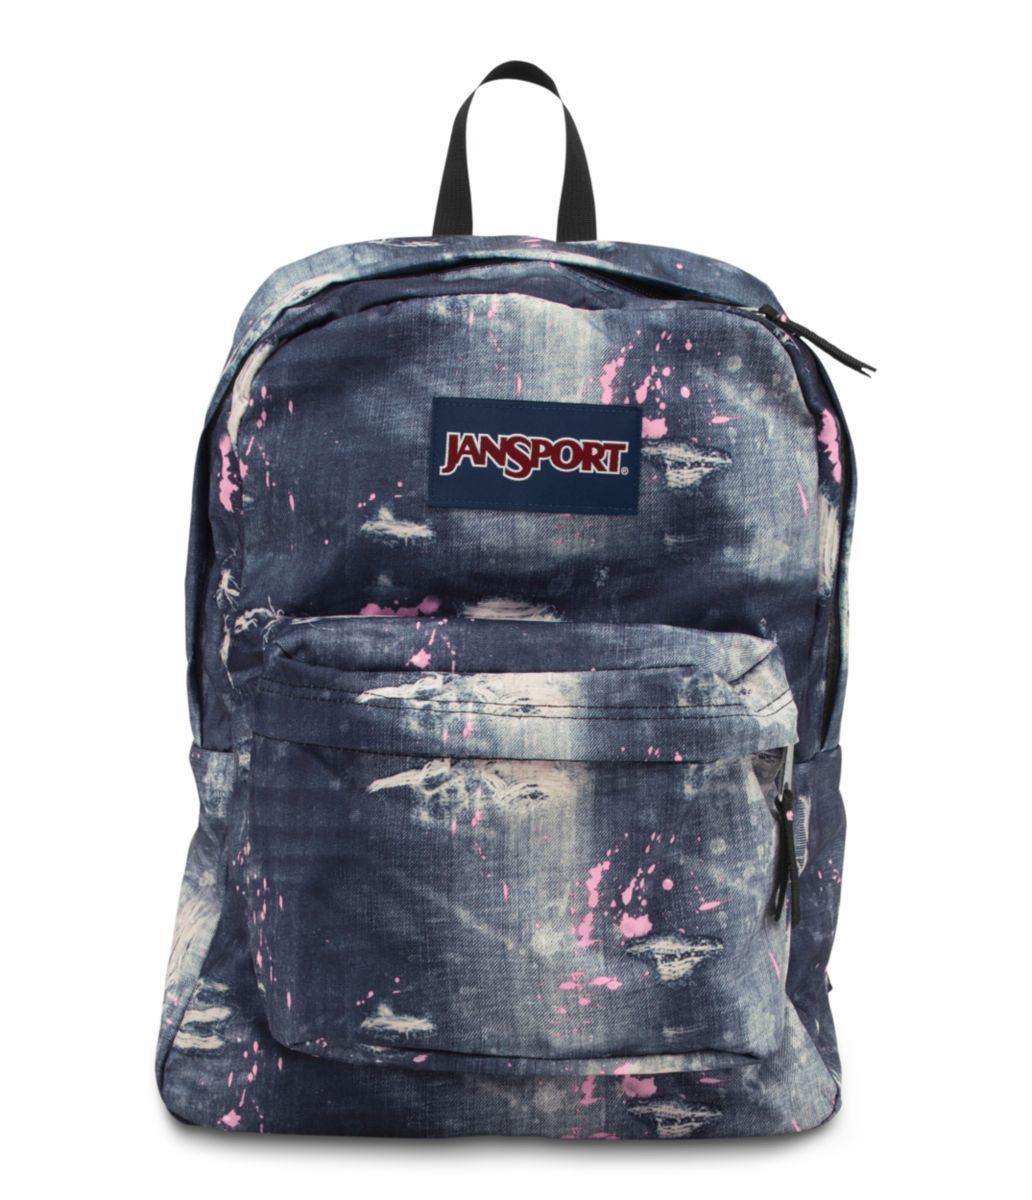 JANSPORT SUPERBREAK BACKPACK SCHOOL BAG - Multi Distressed Denim ...